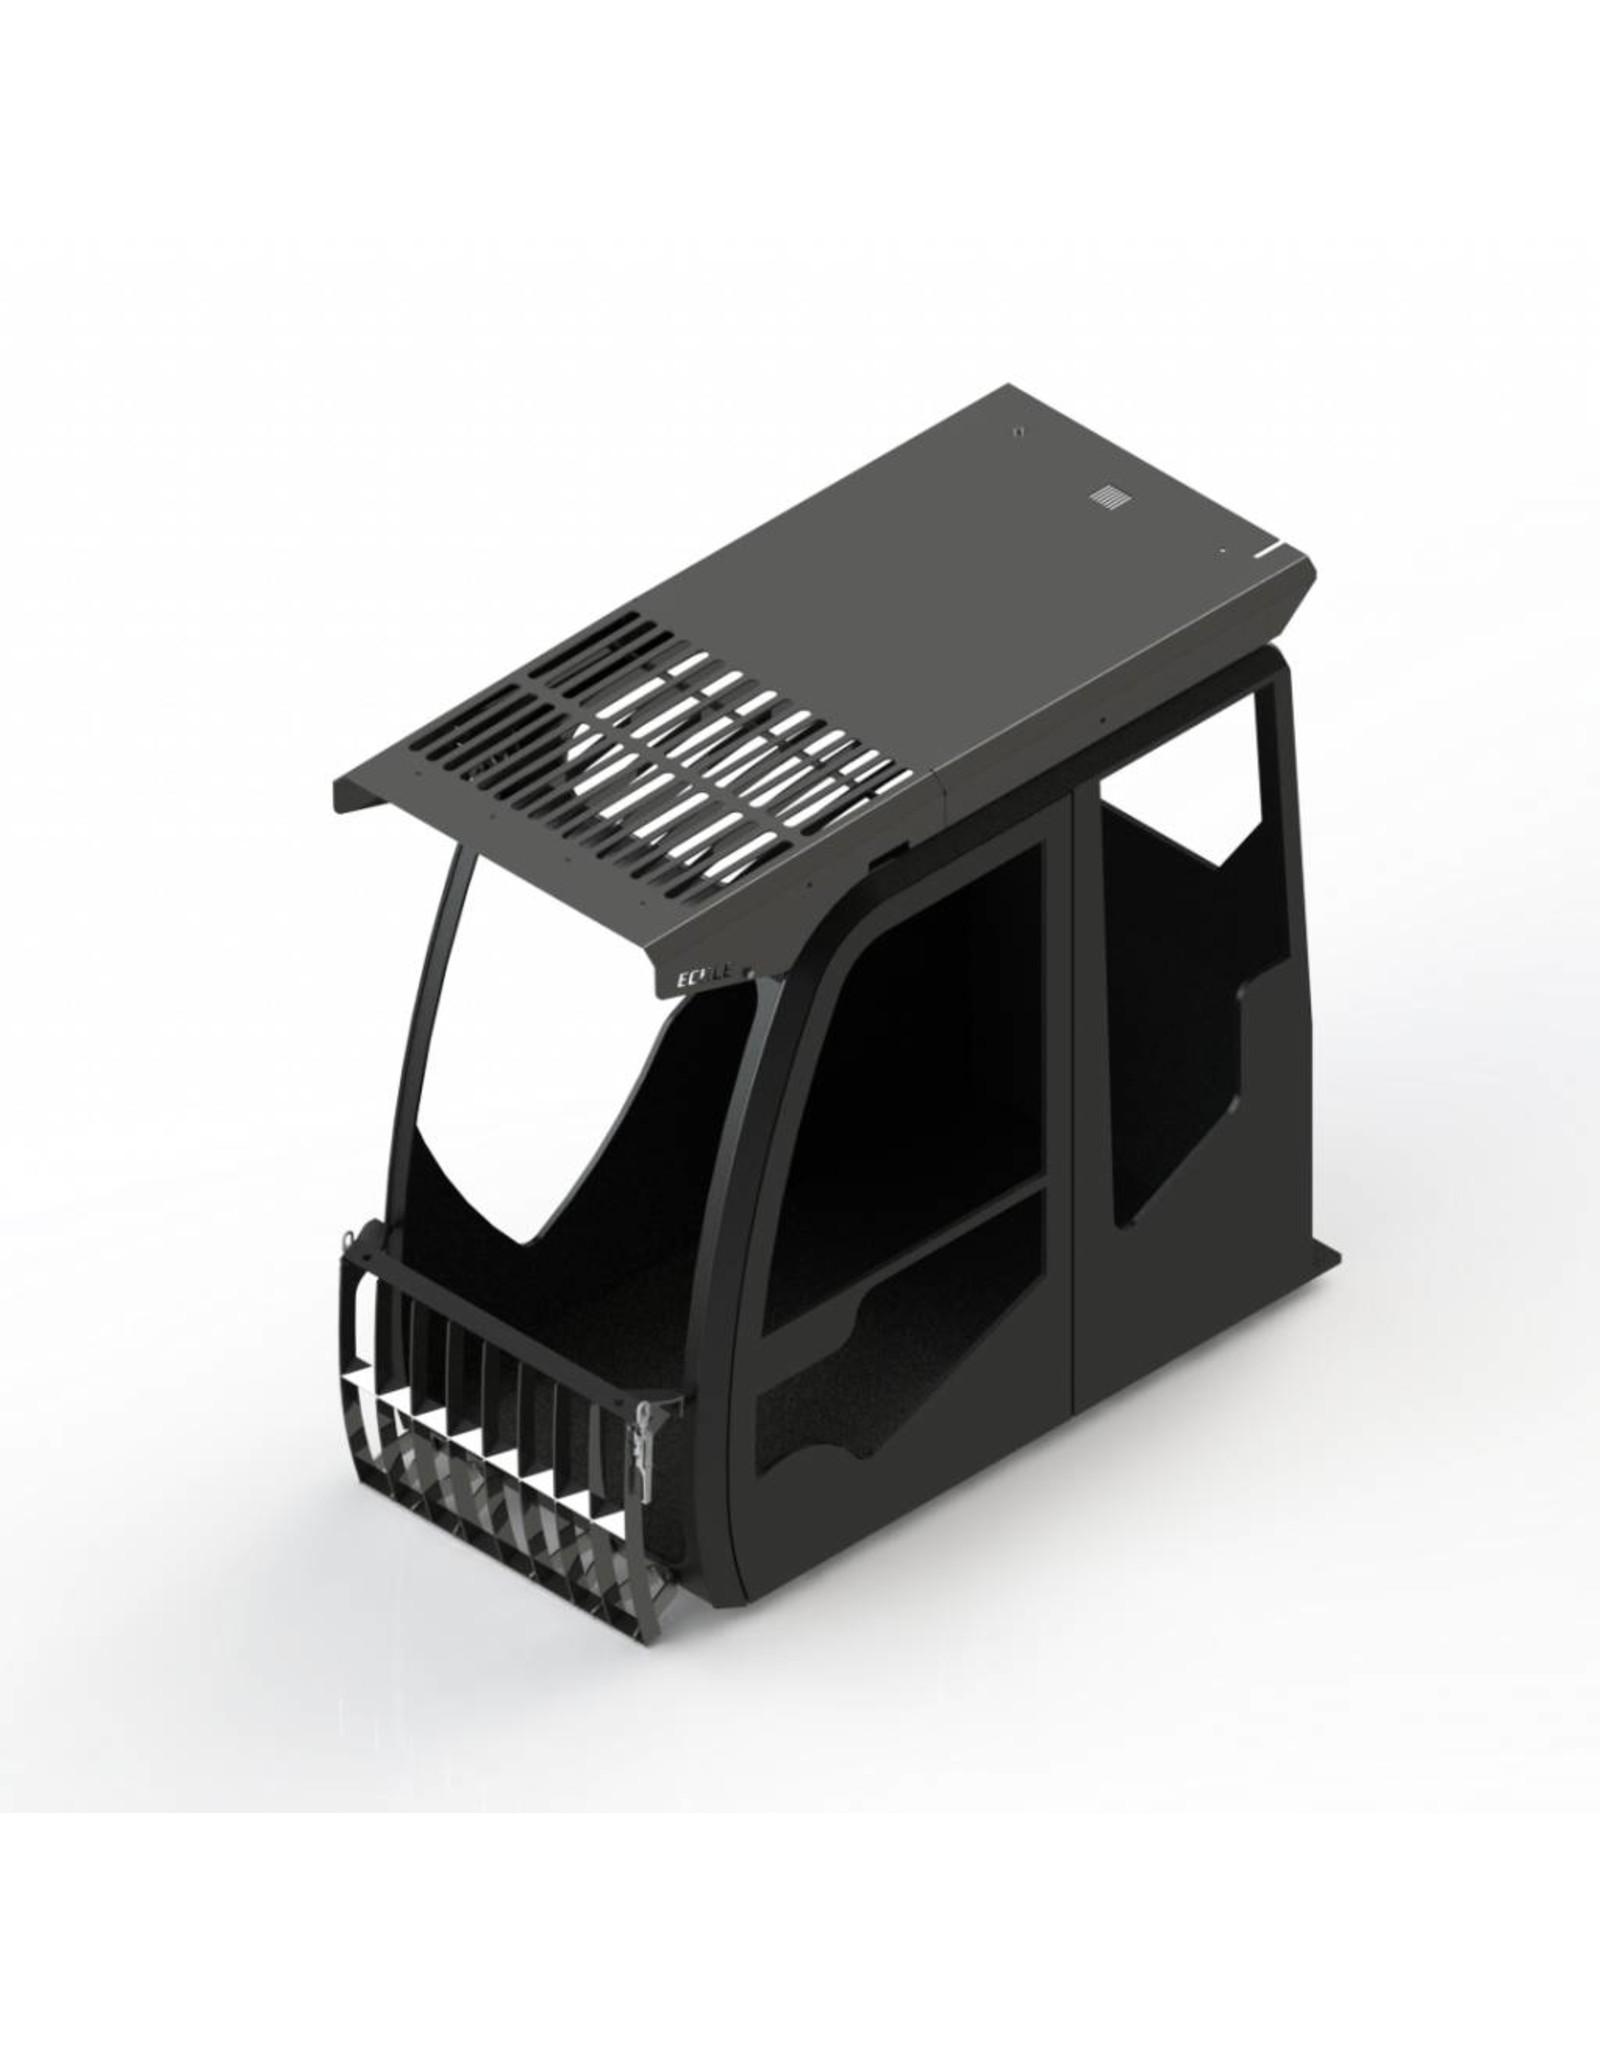 Echle Hartstahl GmbH FOPS for Komatsu PC228USLC-10/11